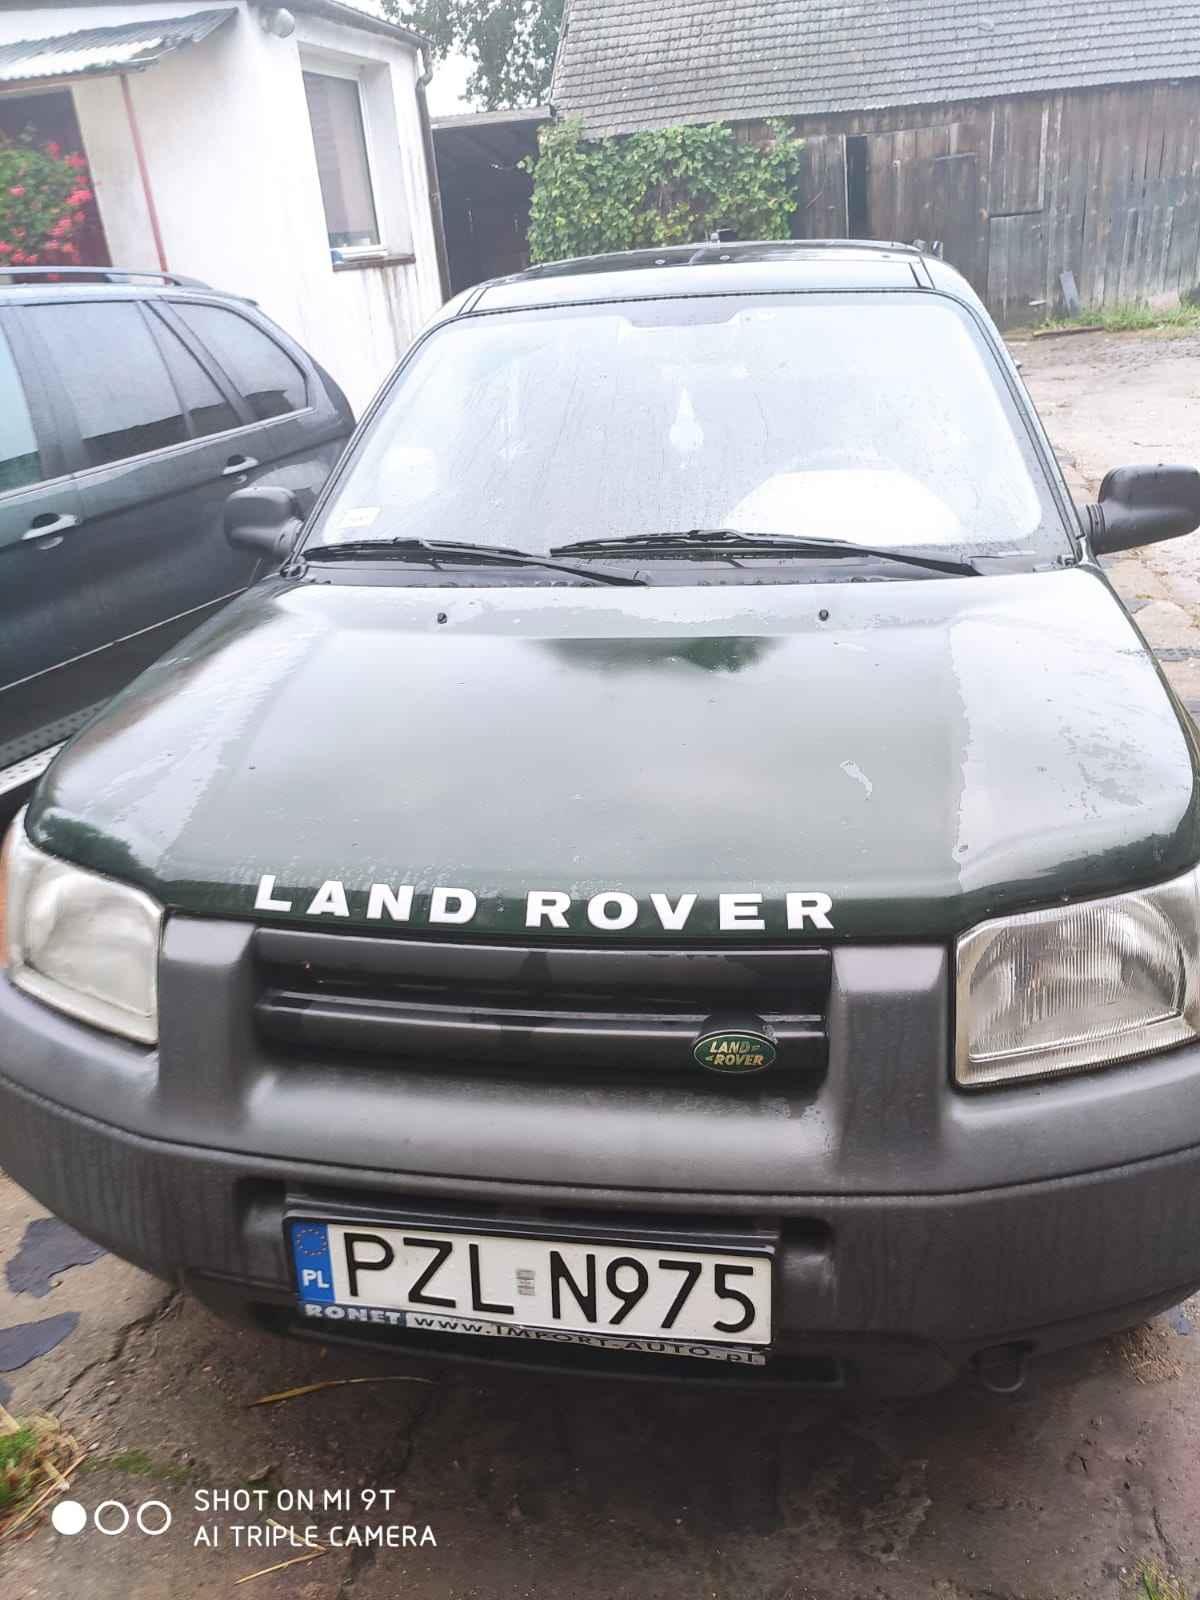 Landrover Freelander Piła - zdjęcie 2